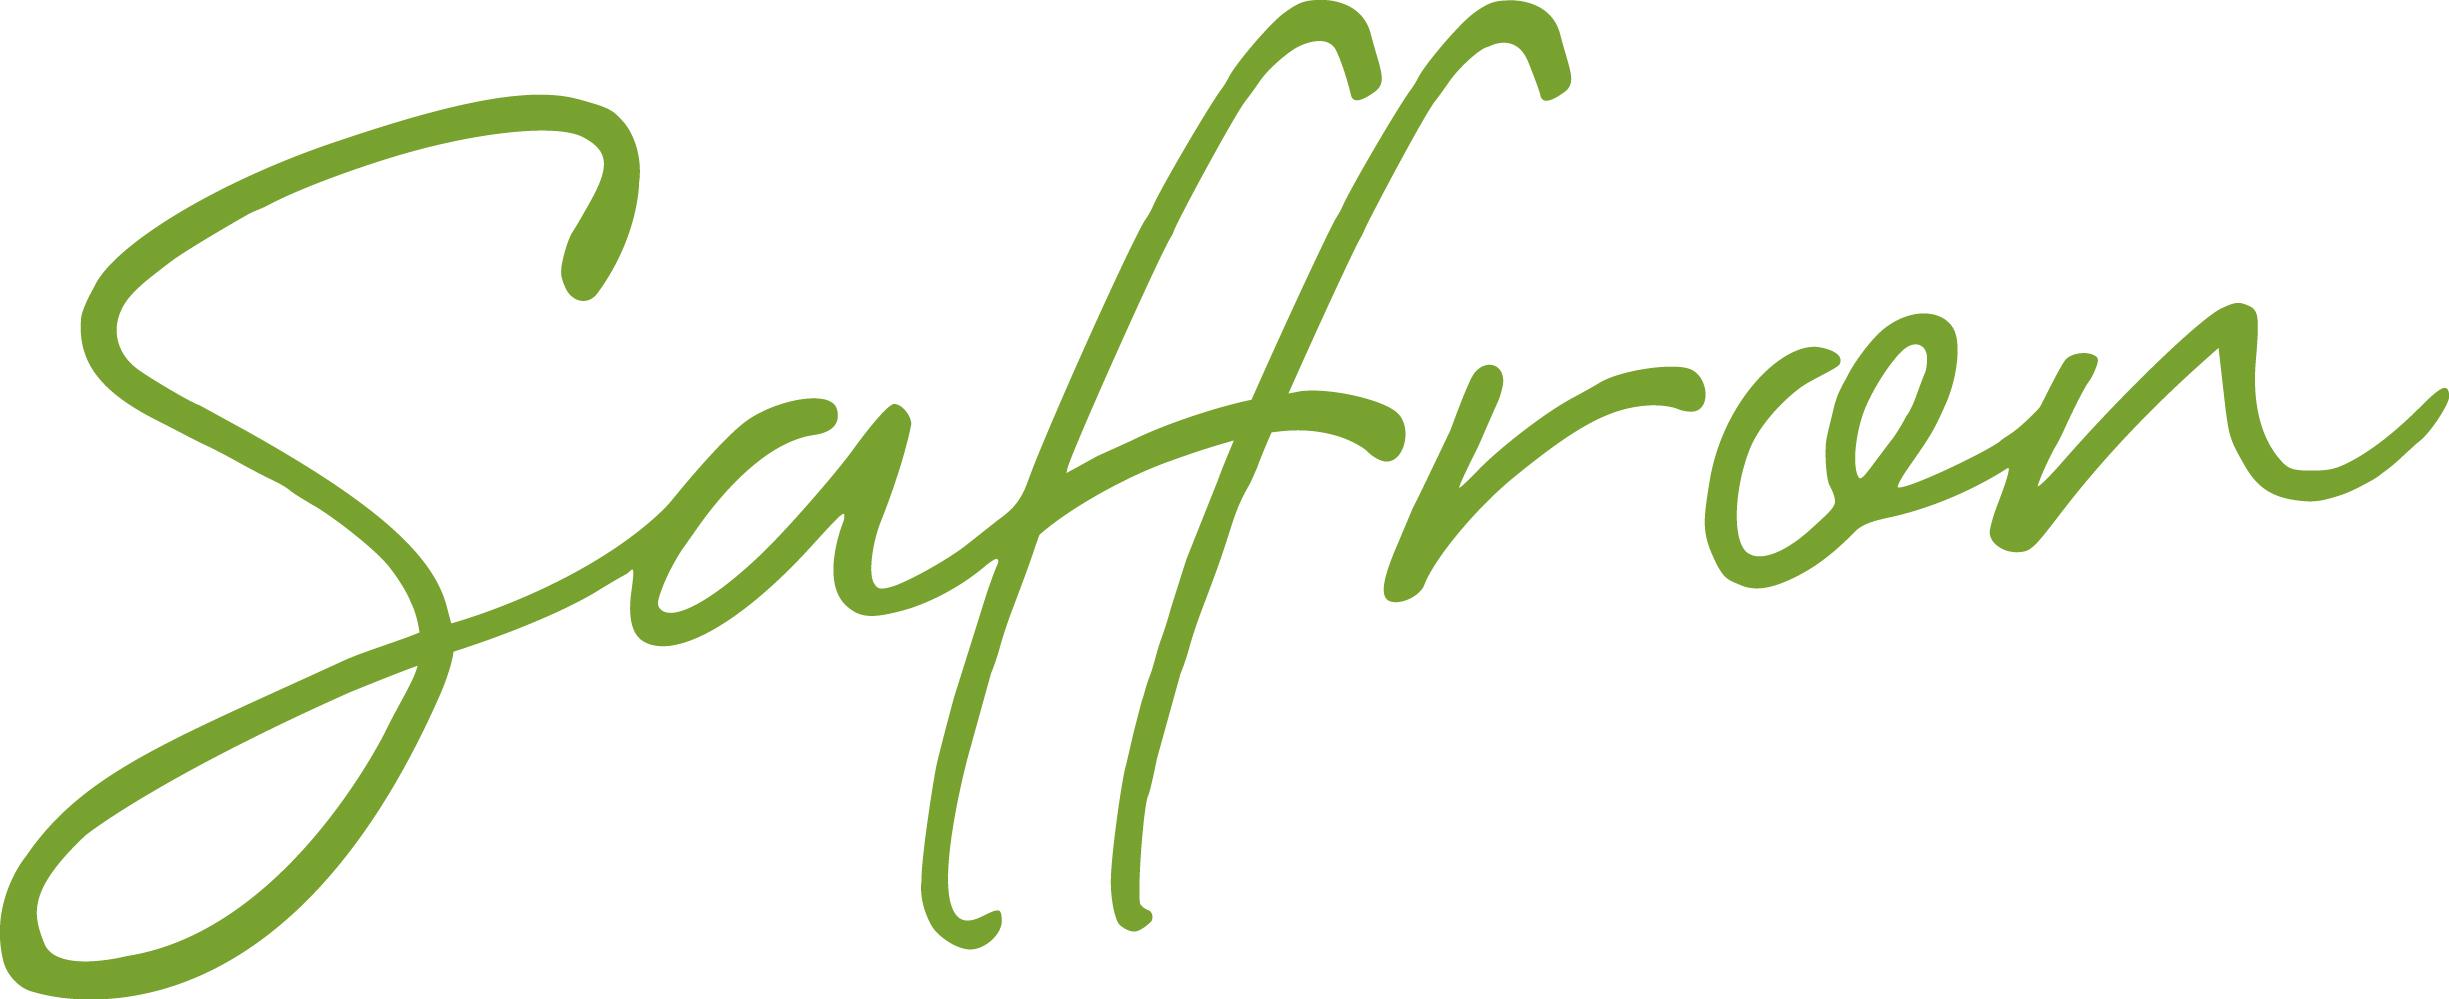 Saffron Contract Catering Success!